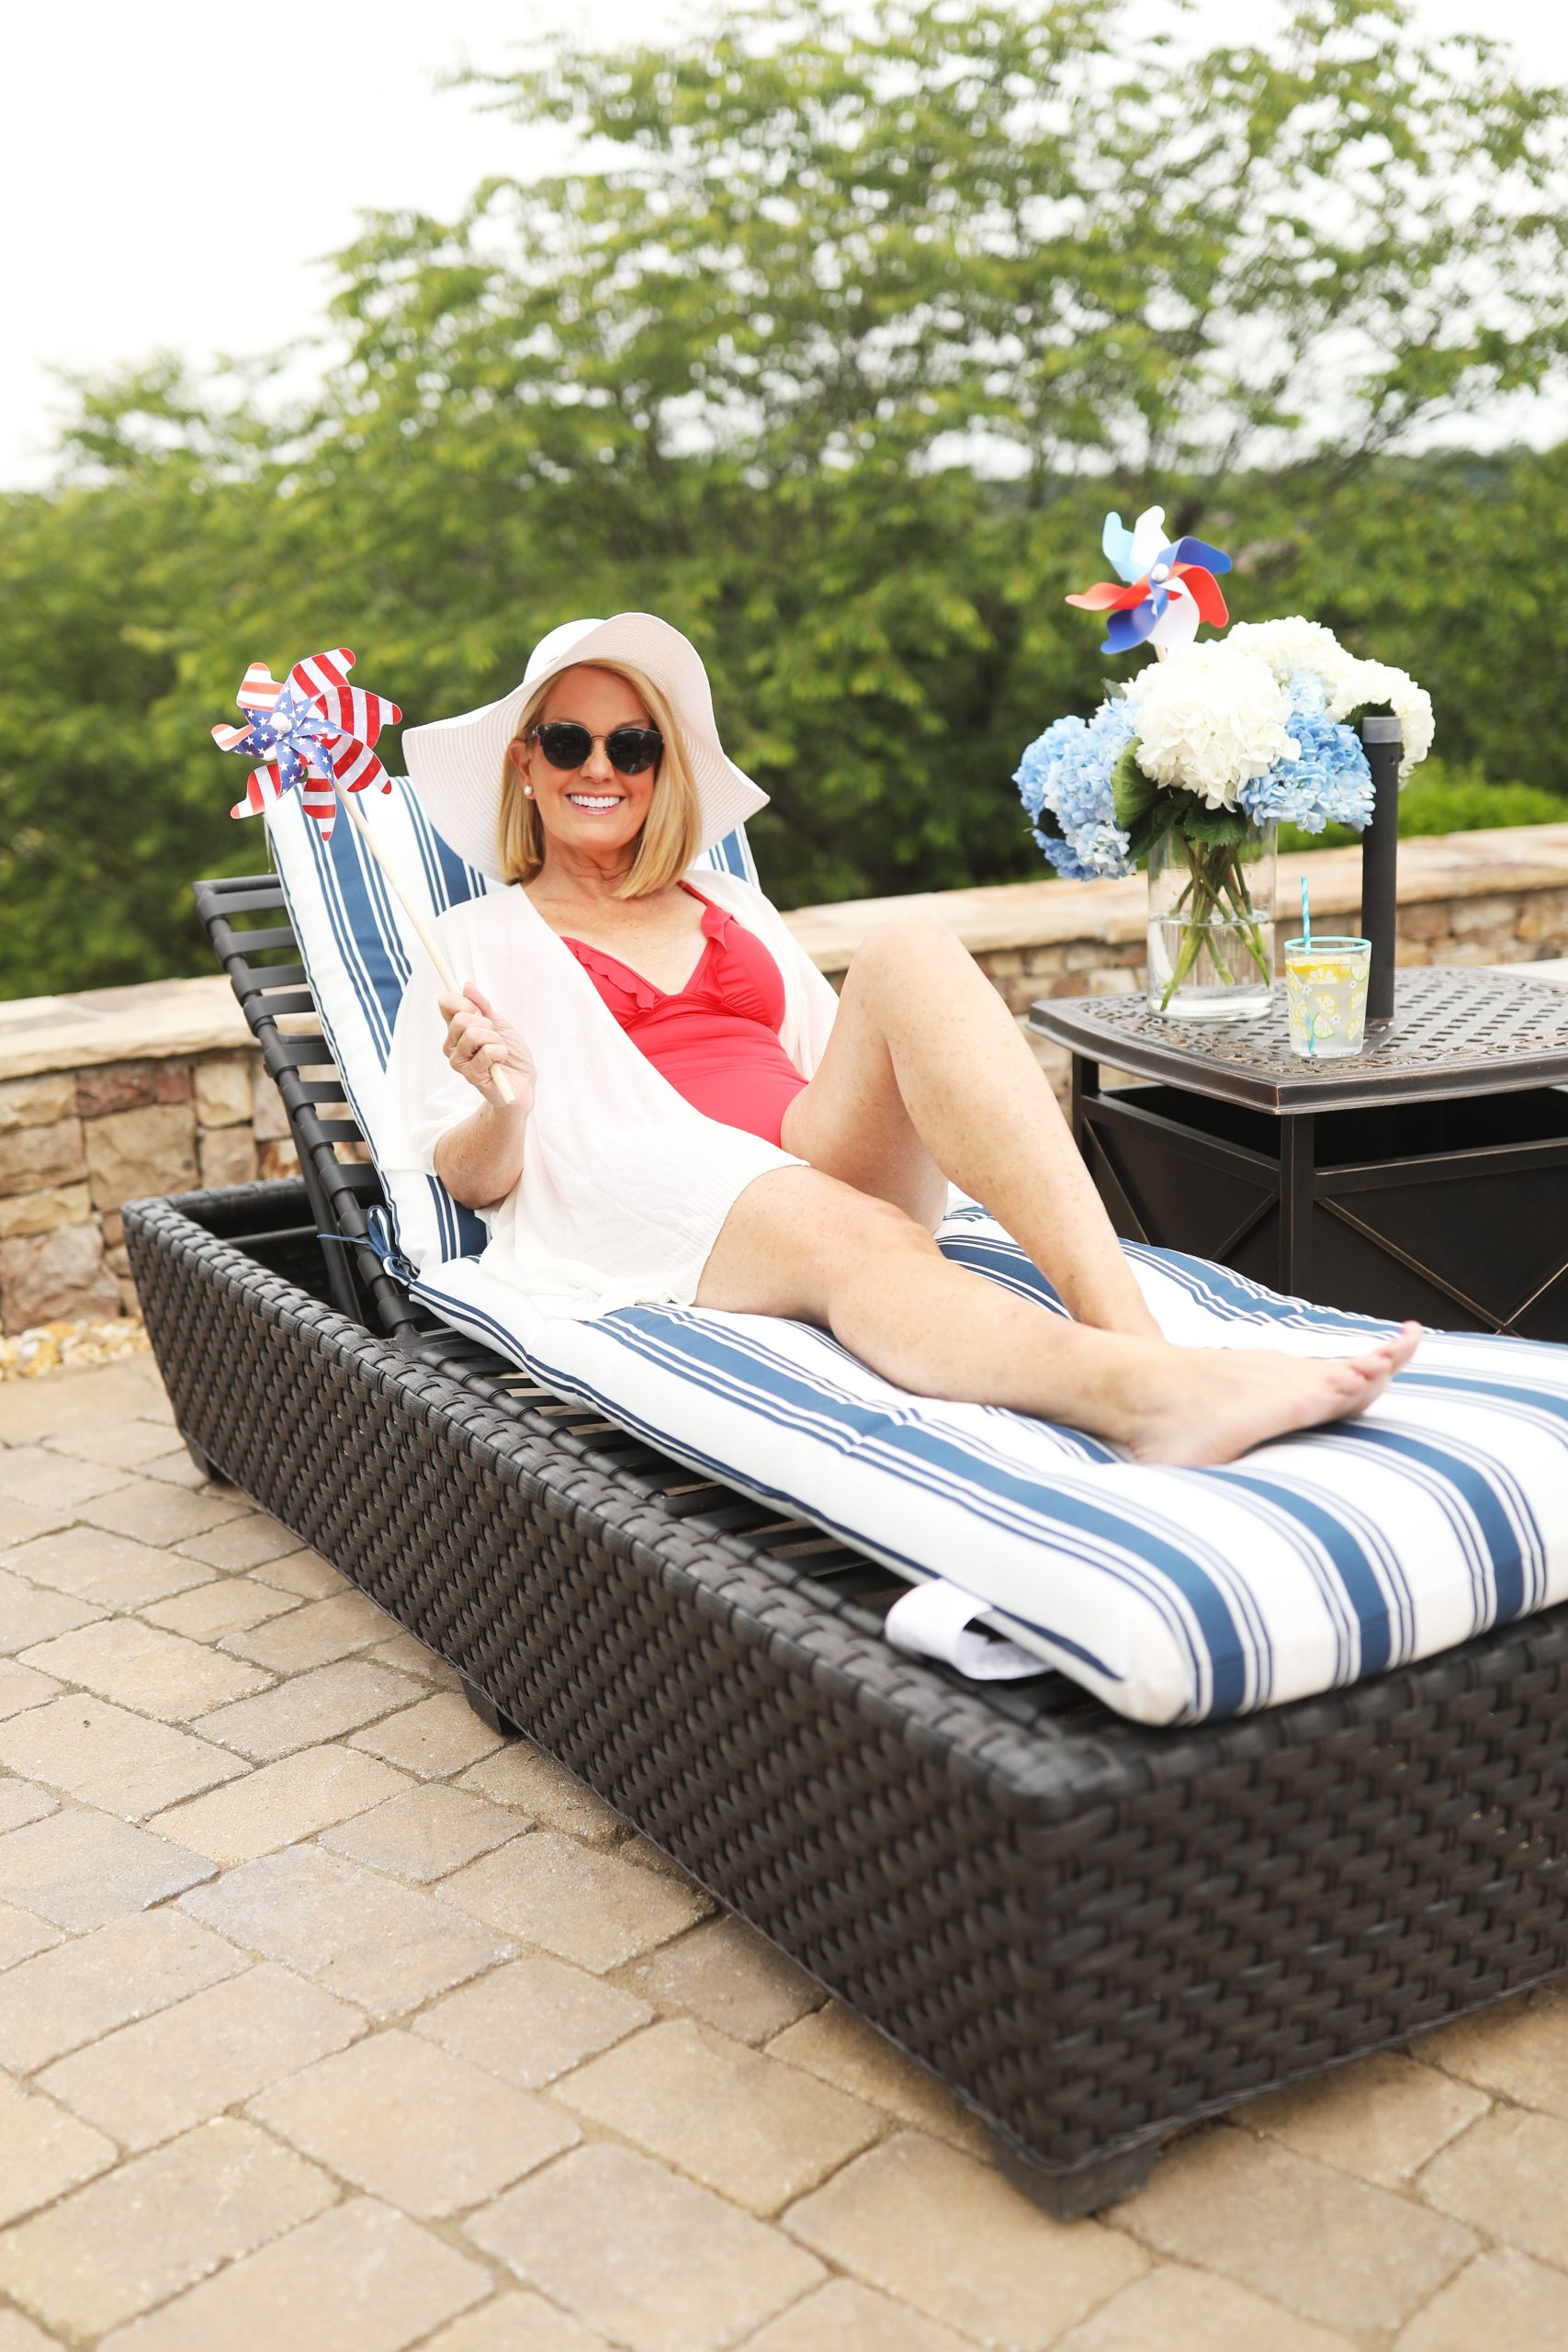 Lori Allen feels patriotic at her annual Memorial Day BBQ celebration